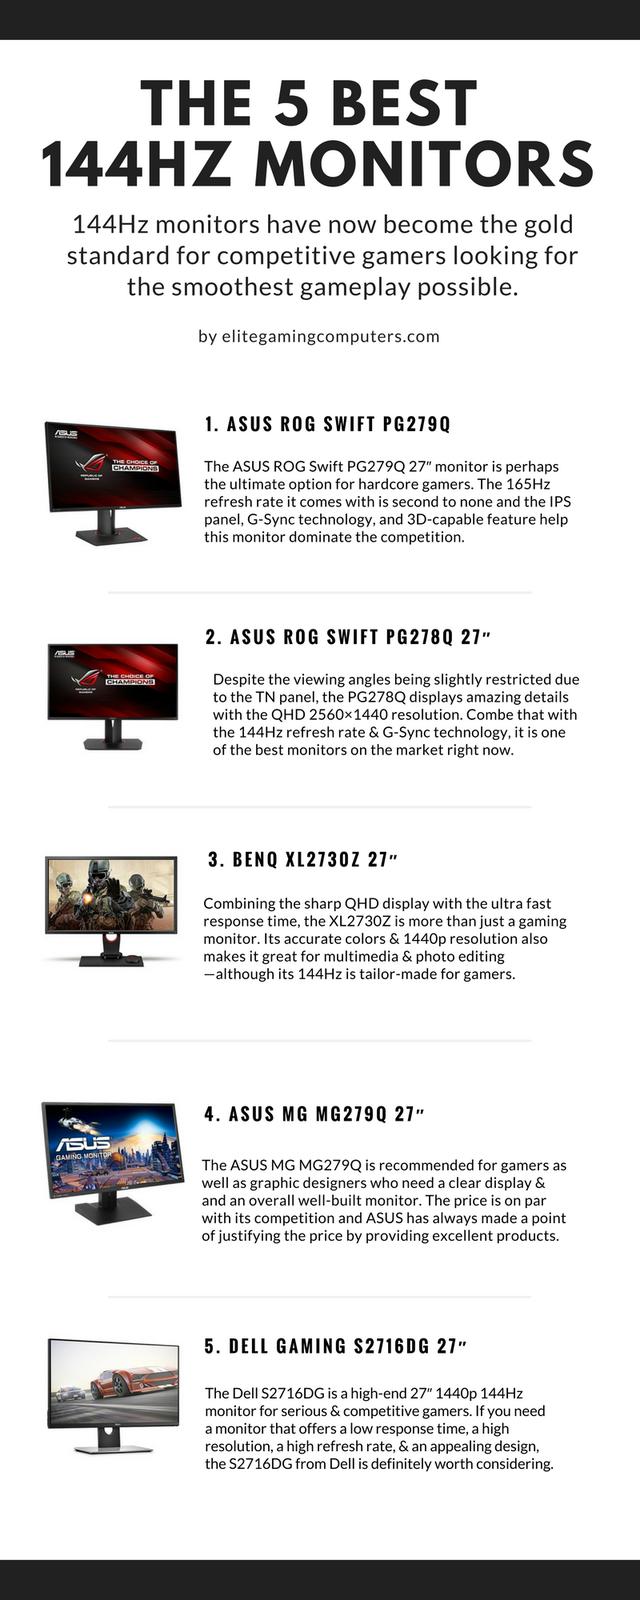 144hz monitor infographic